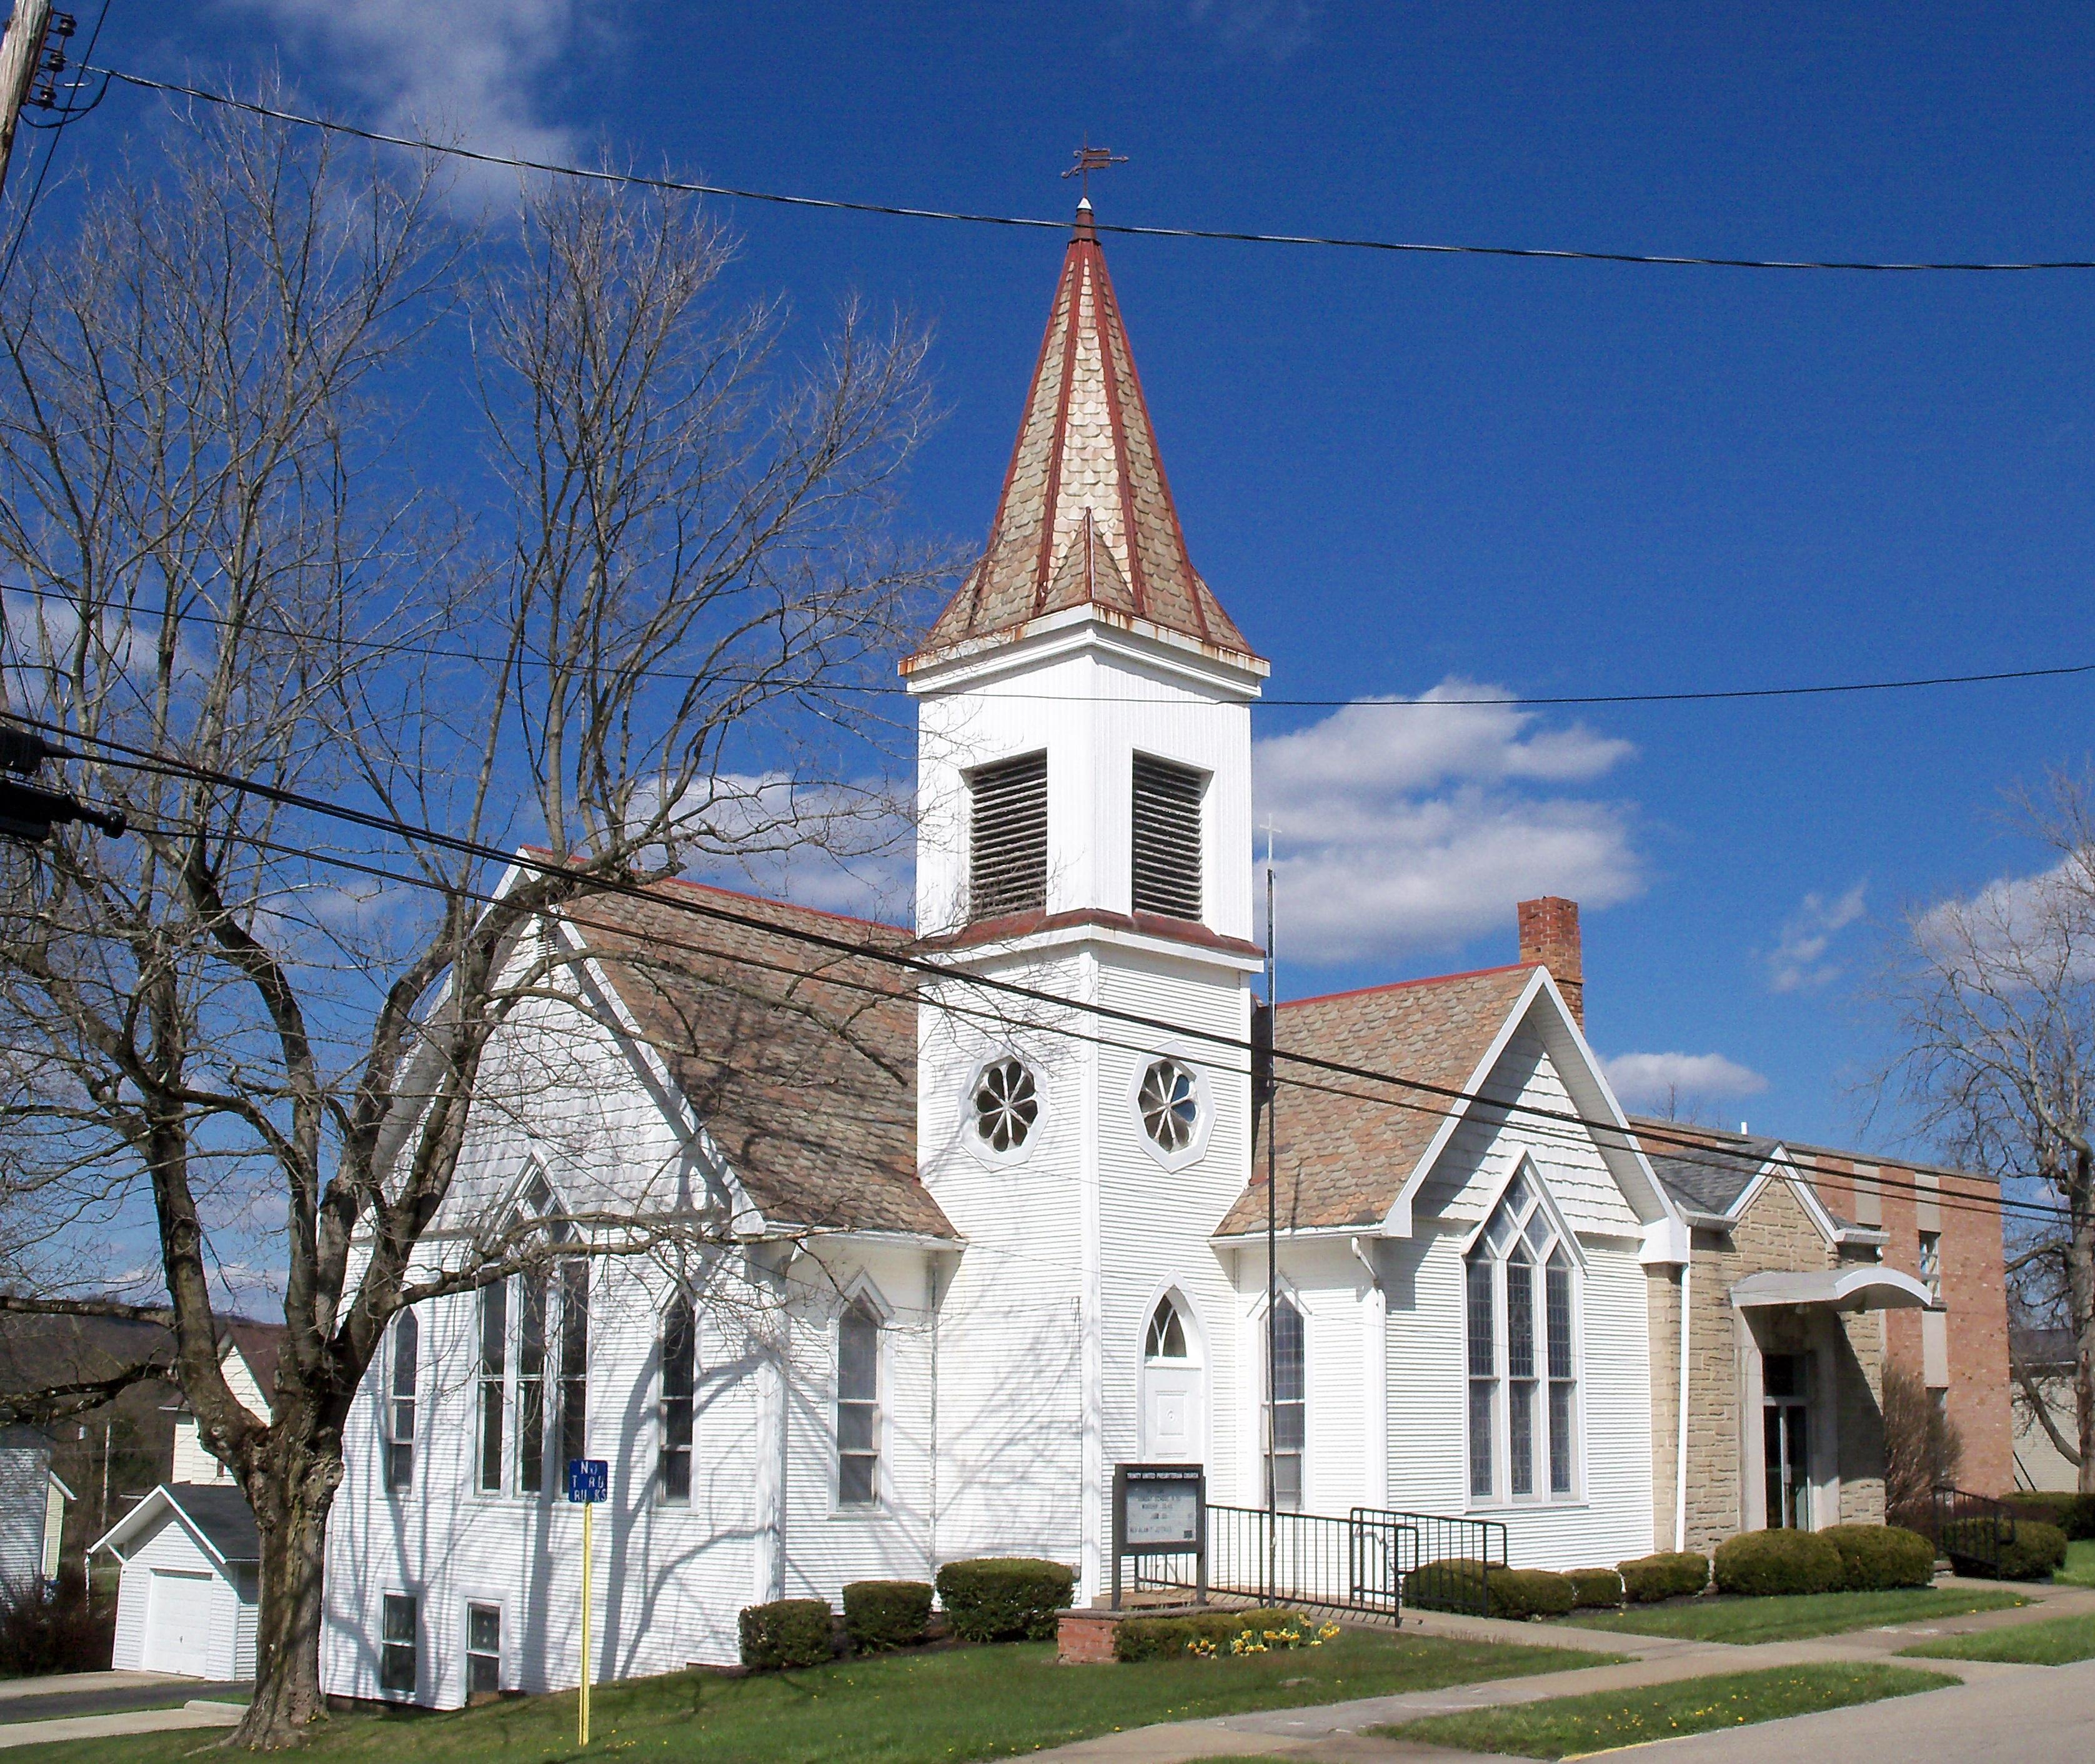 Ohio jefferson county bergholz - File Bergholz Ohio Trinity United Presbyterian Church Jpg